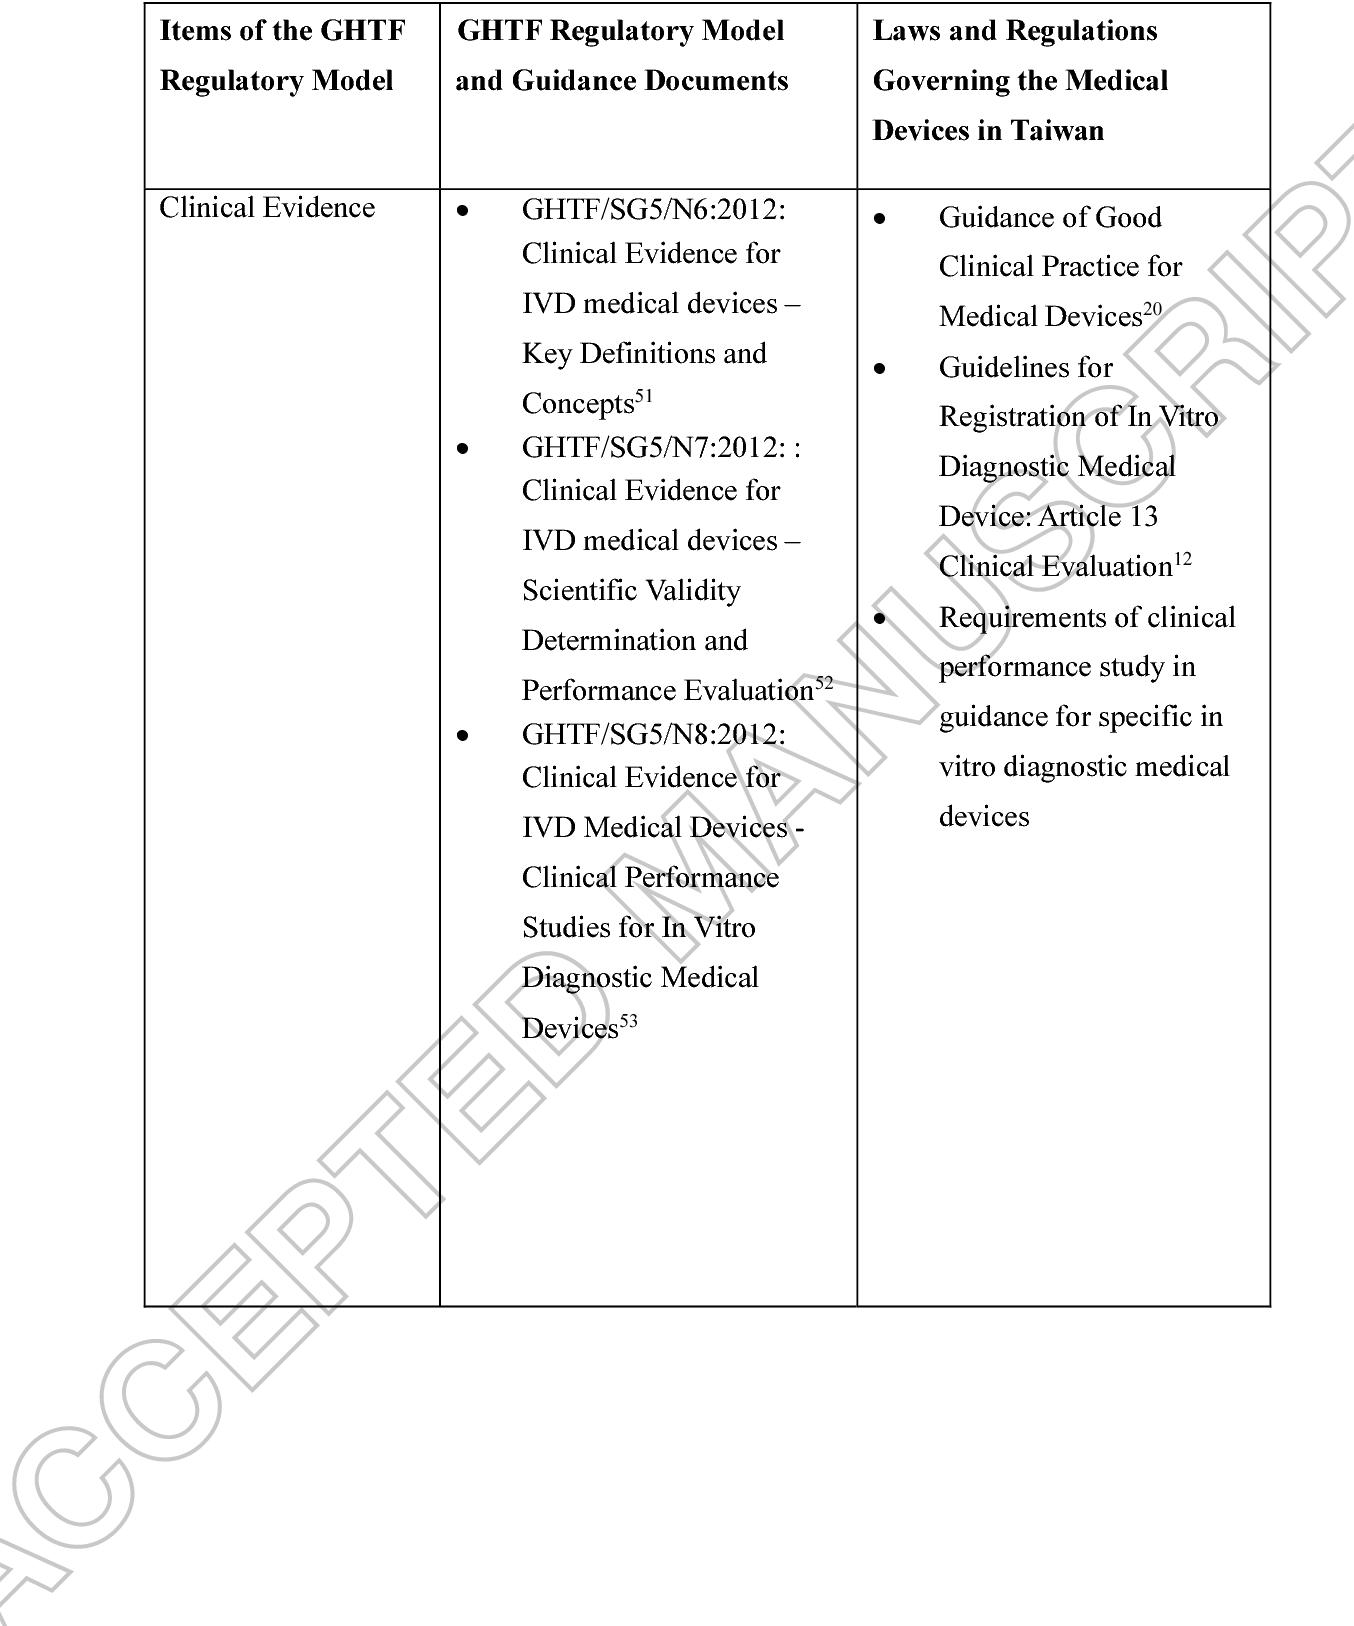 fda vs eu medical device regulation